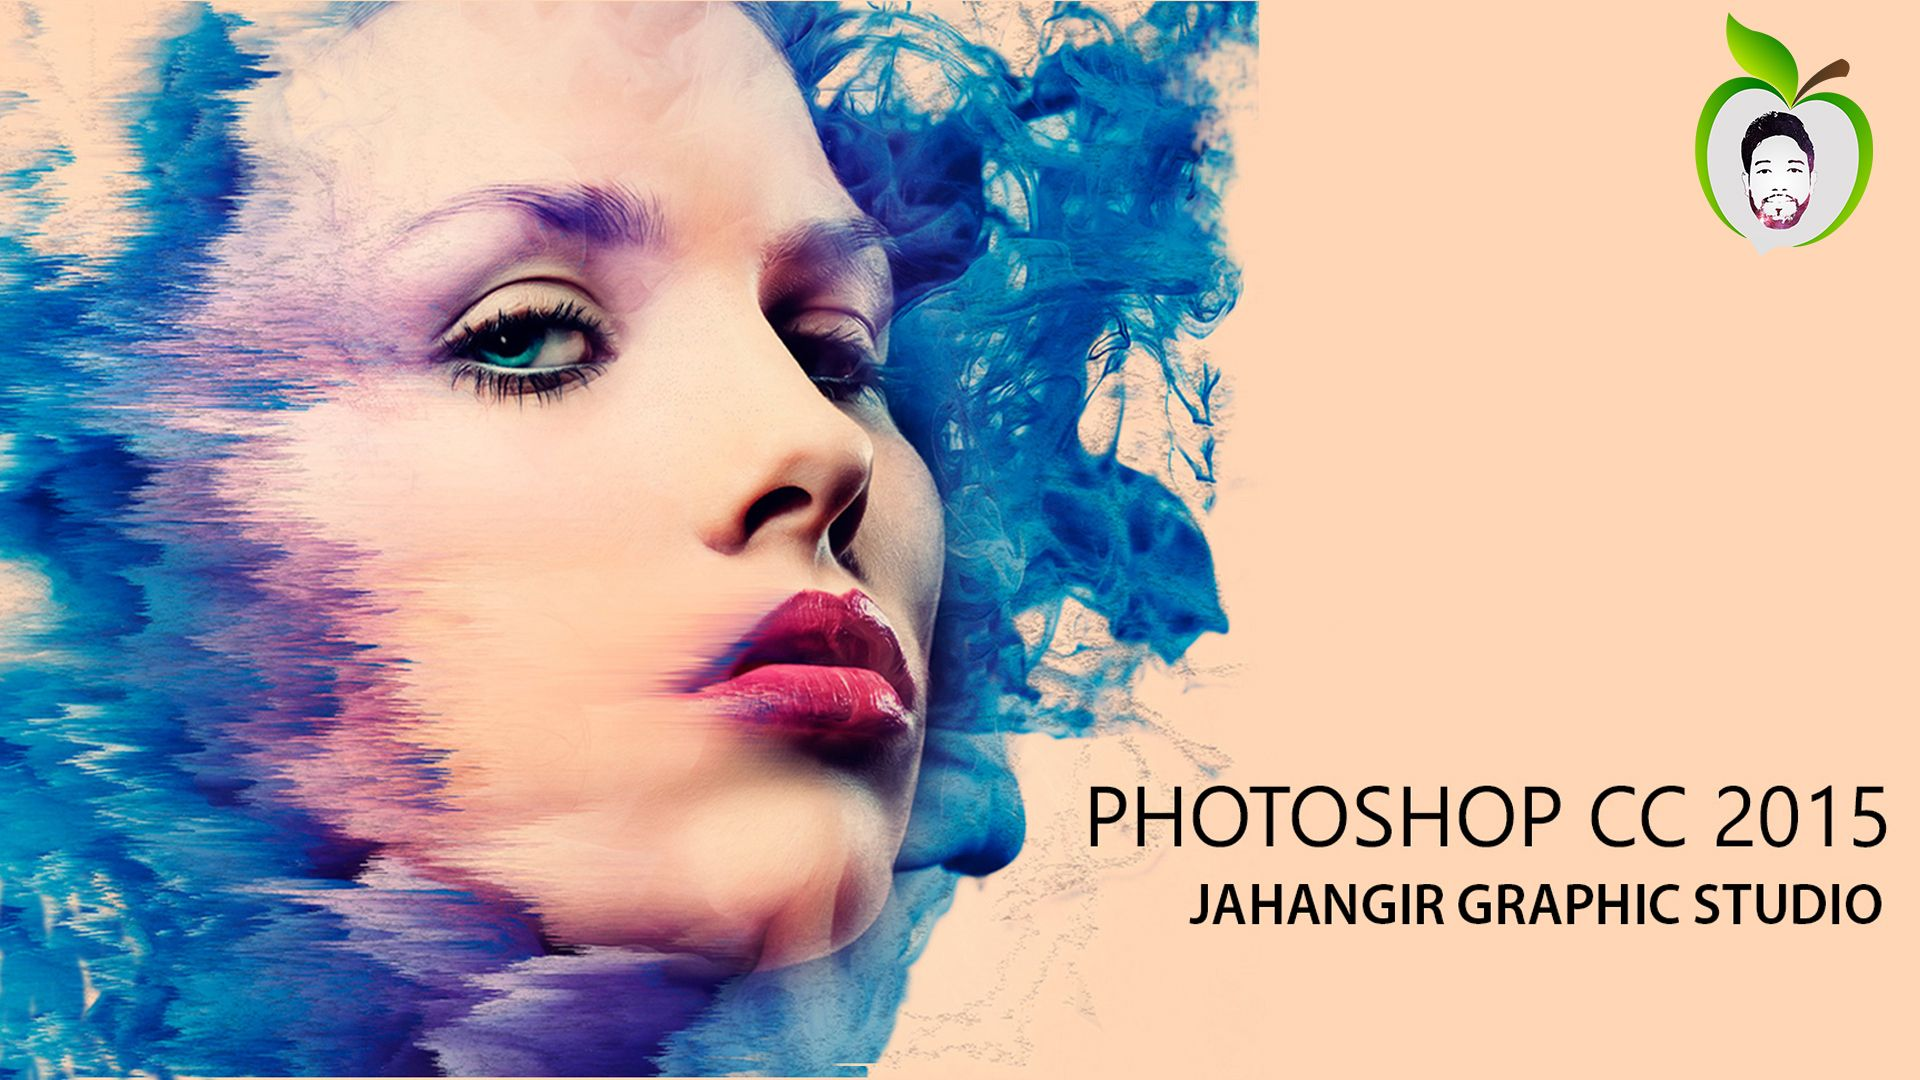 Installing Adobe Photoshop Cc 2015 Full Version In 2020 Photoshop Tutorial Photoshop Learn Photoshop